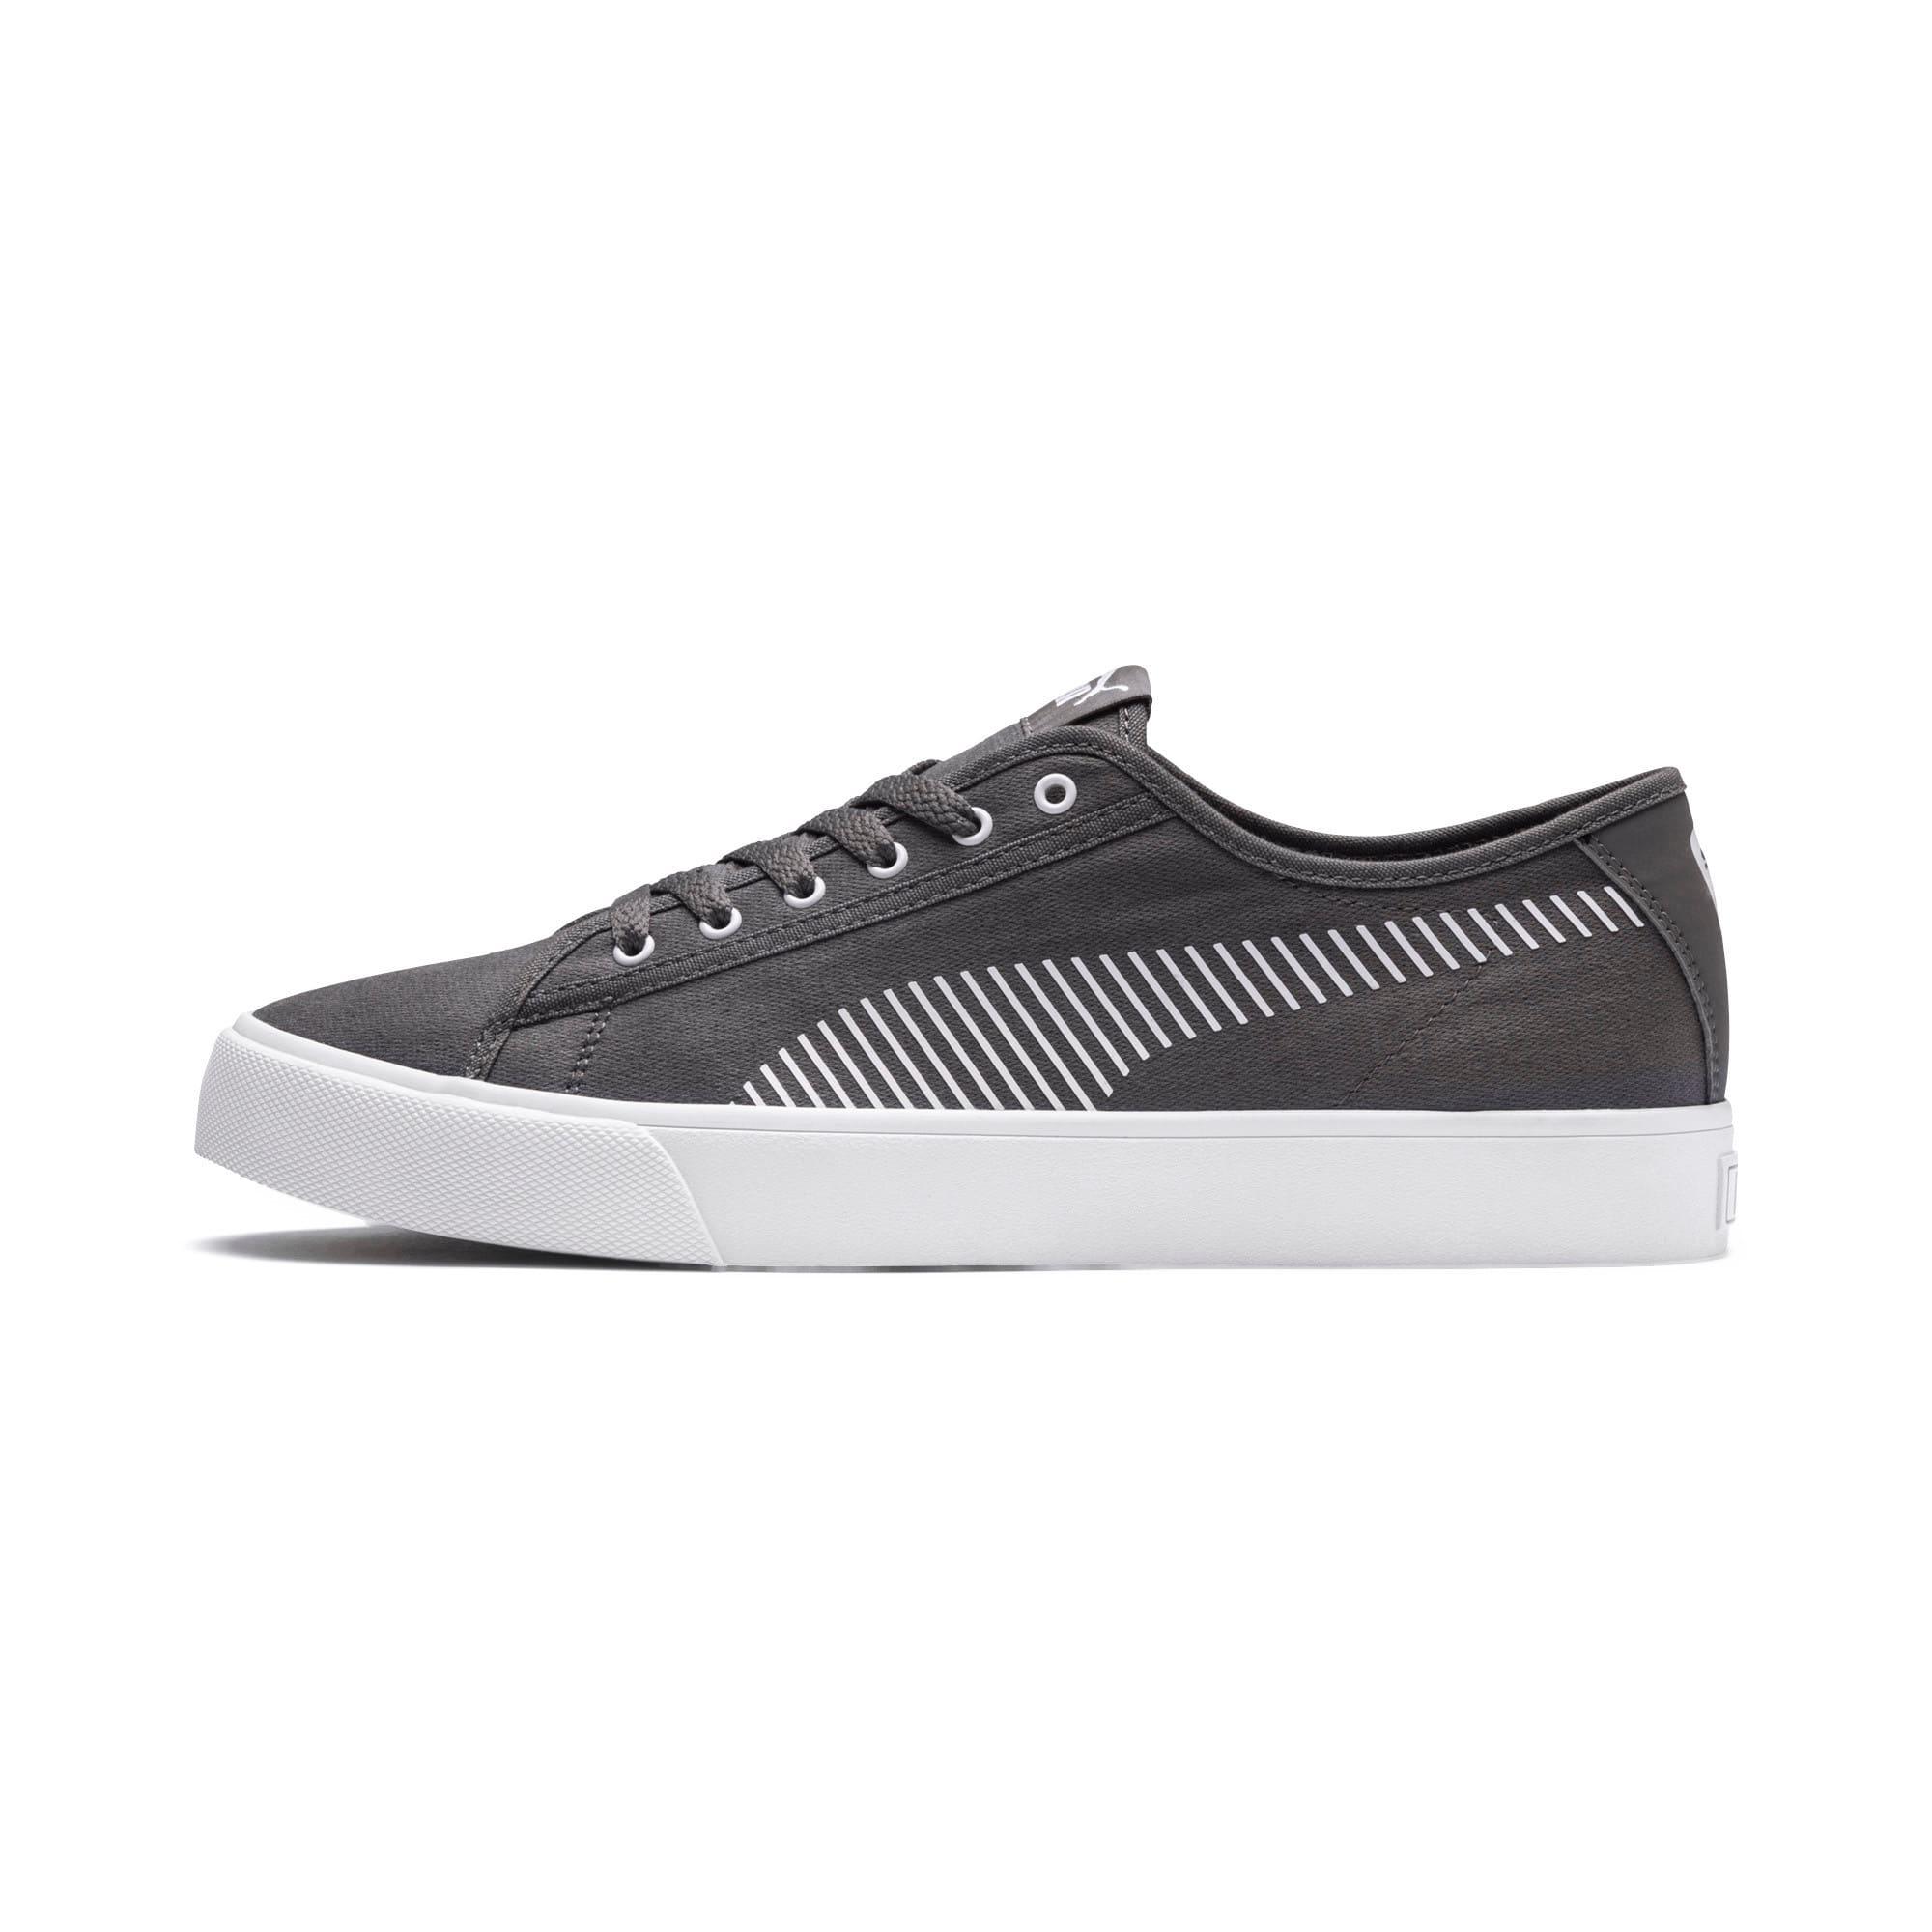 Thumbnail 1 of Bari Sneakers, Charcoal Gray-Puma White, medium